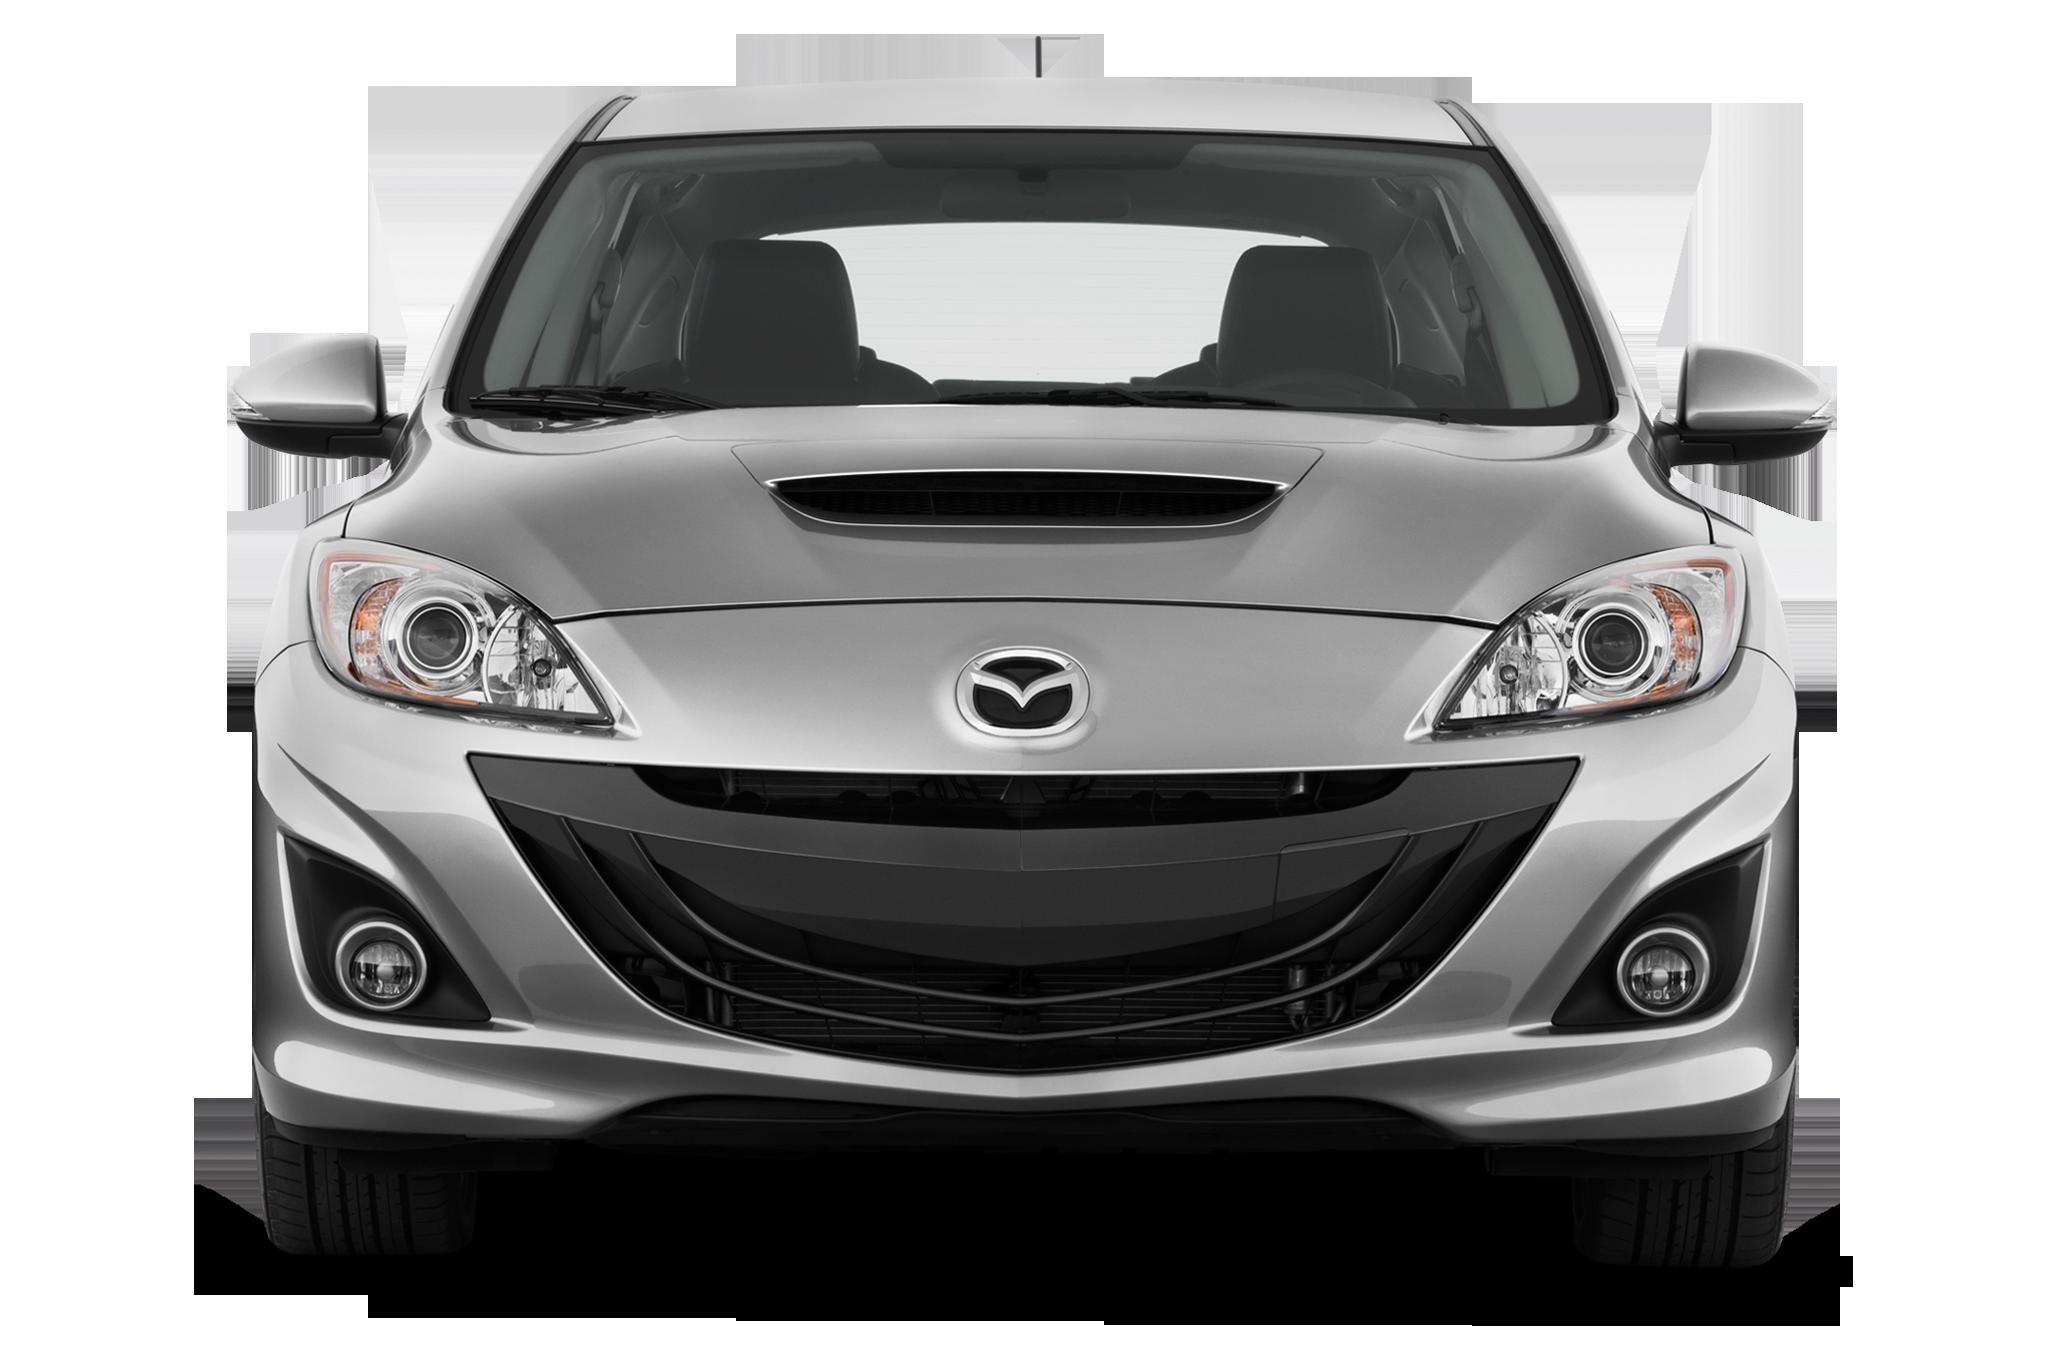 Mazda3 Vs Hyundai Elantra All New Car Release And Reviews 2013 Mazda 6 Wiring Diagrams 2010 3 Parts Diagram Bumper For